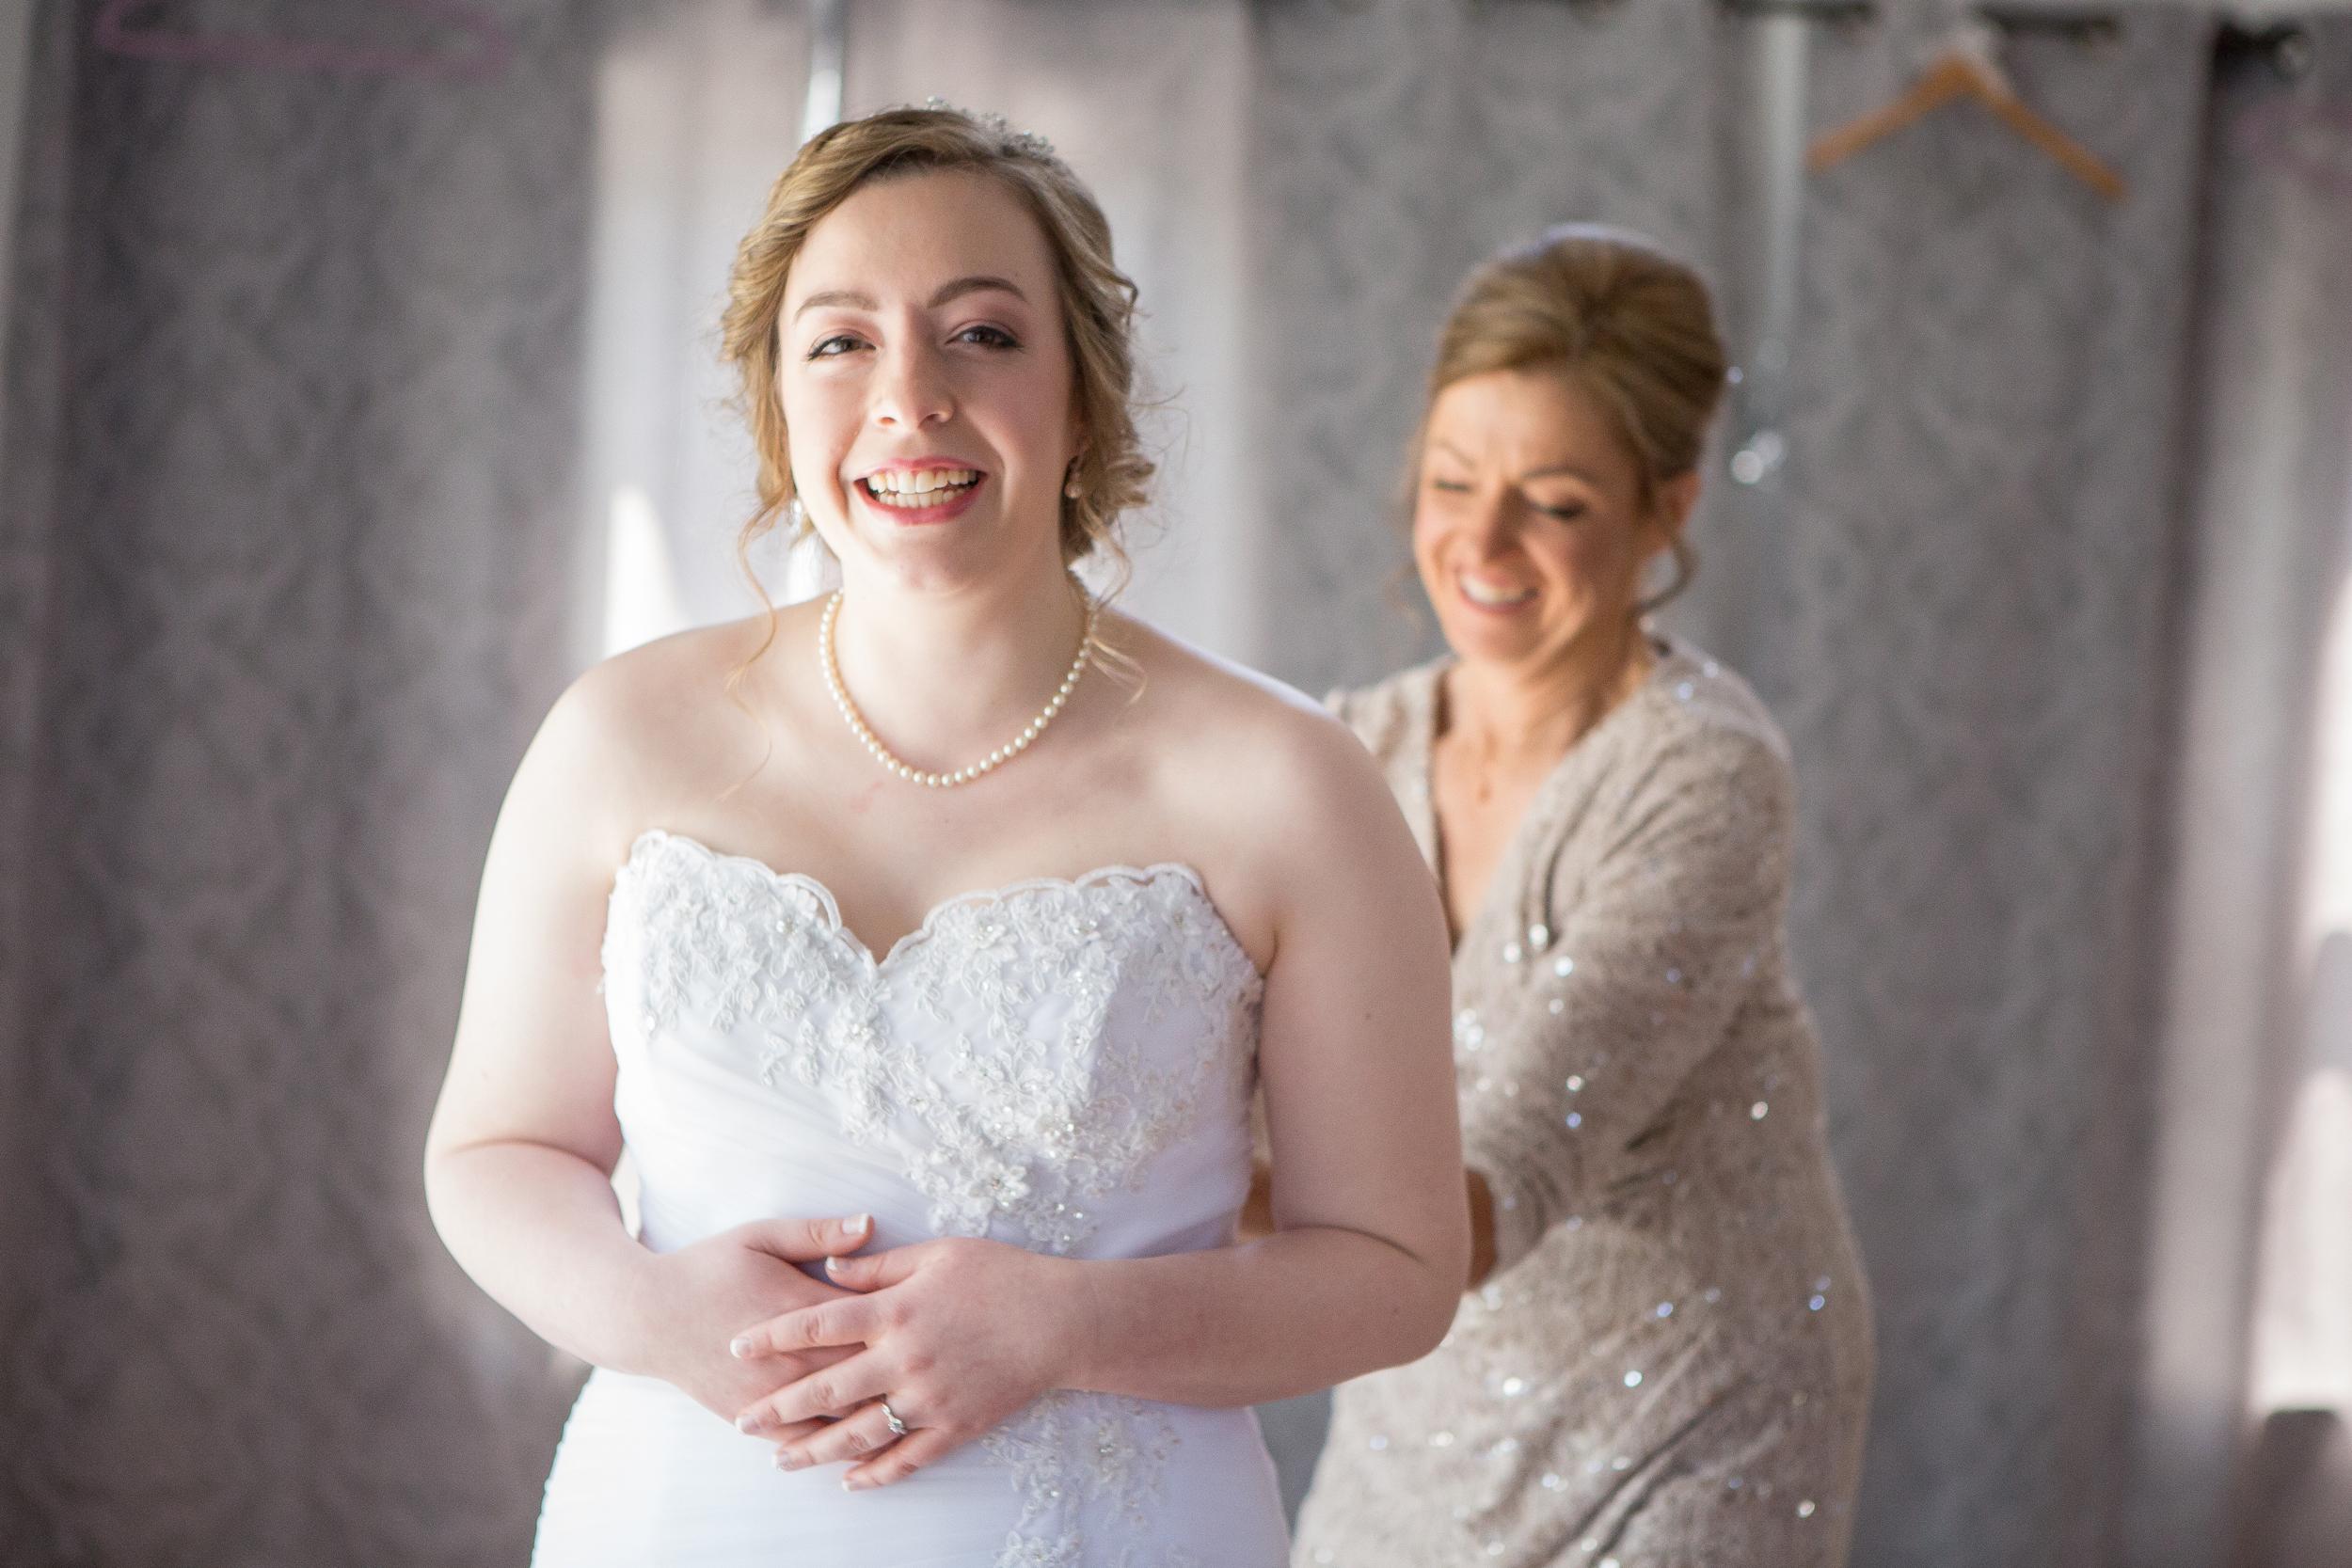 Rochester Wedding Photography - At Bridal Salon